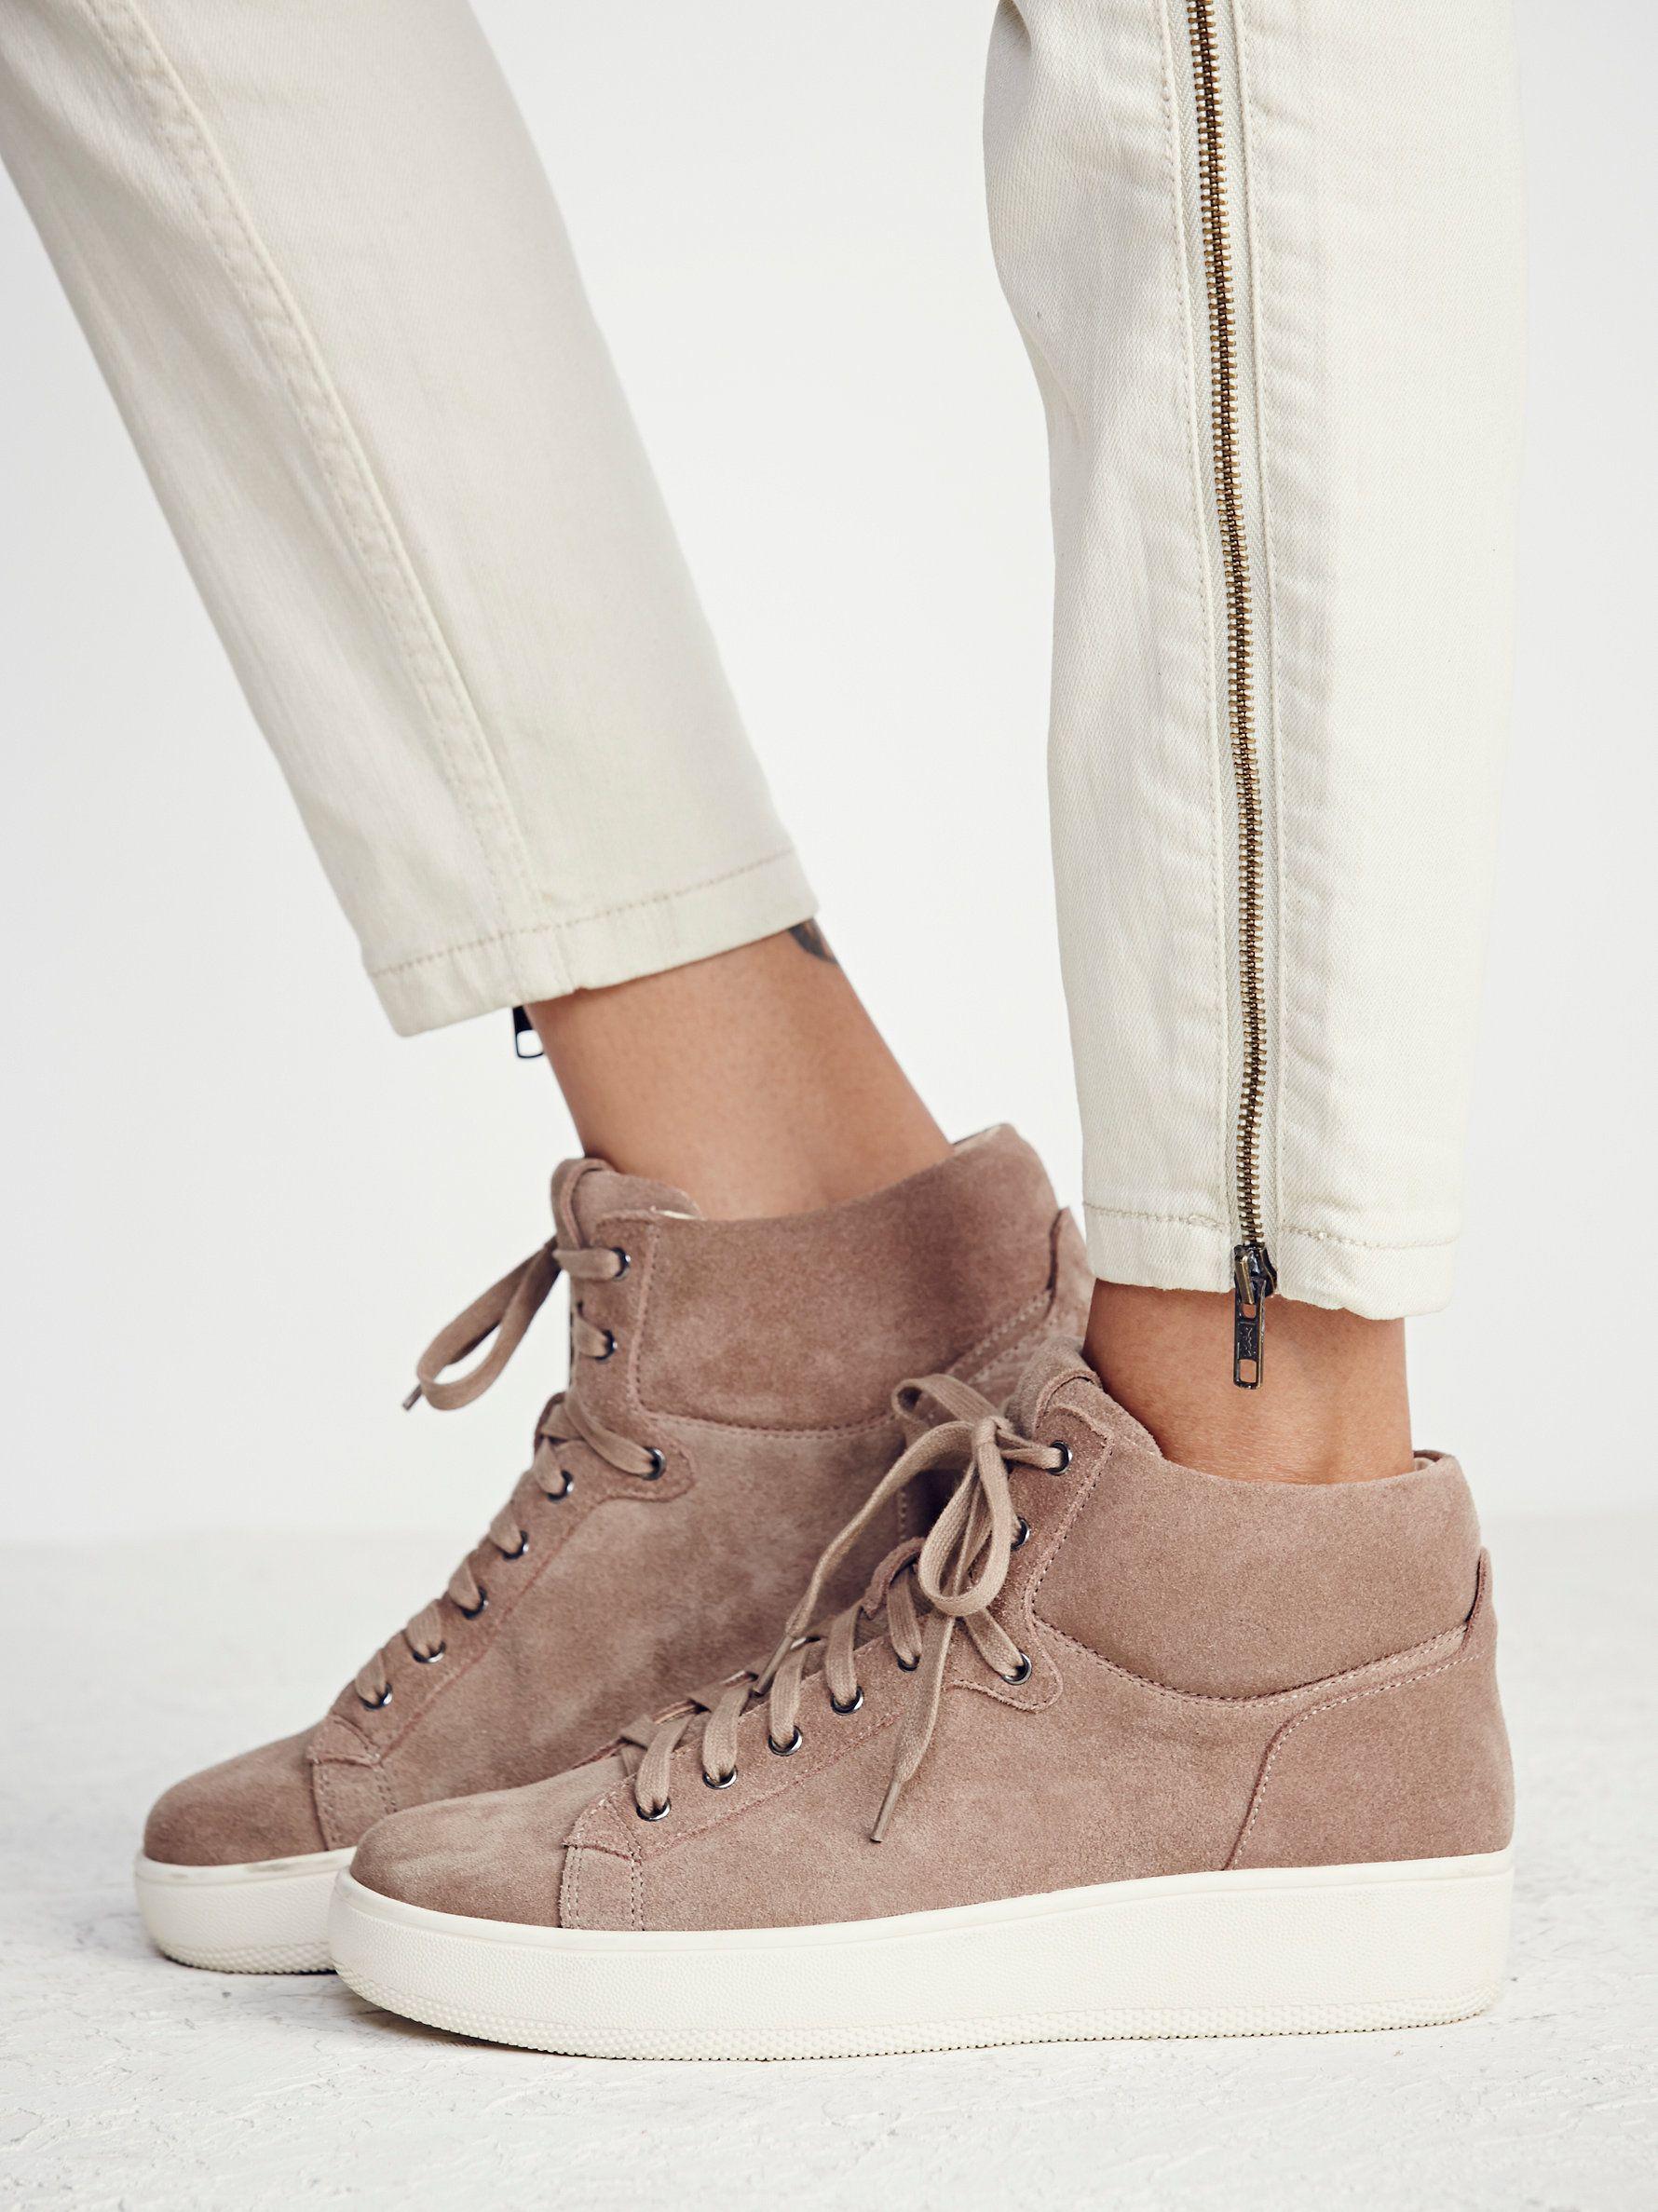 Upsider High Top Sneaker | Sneakers, High top sneakers, Shoes